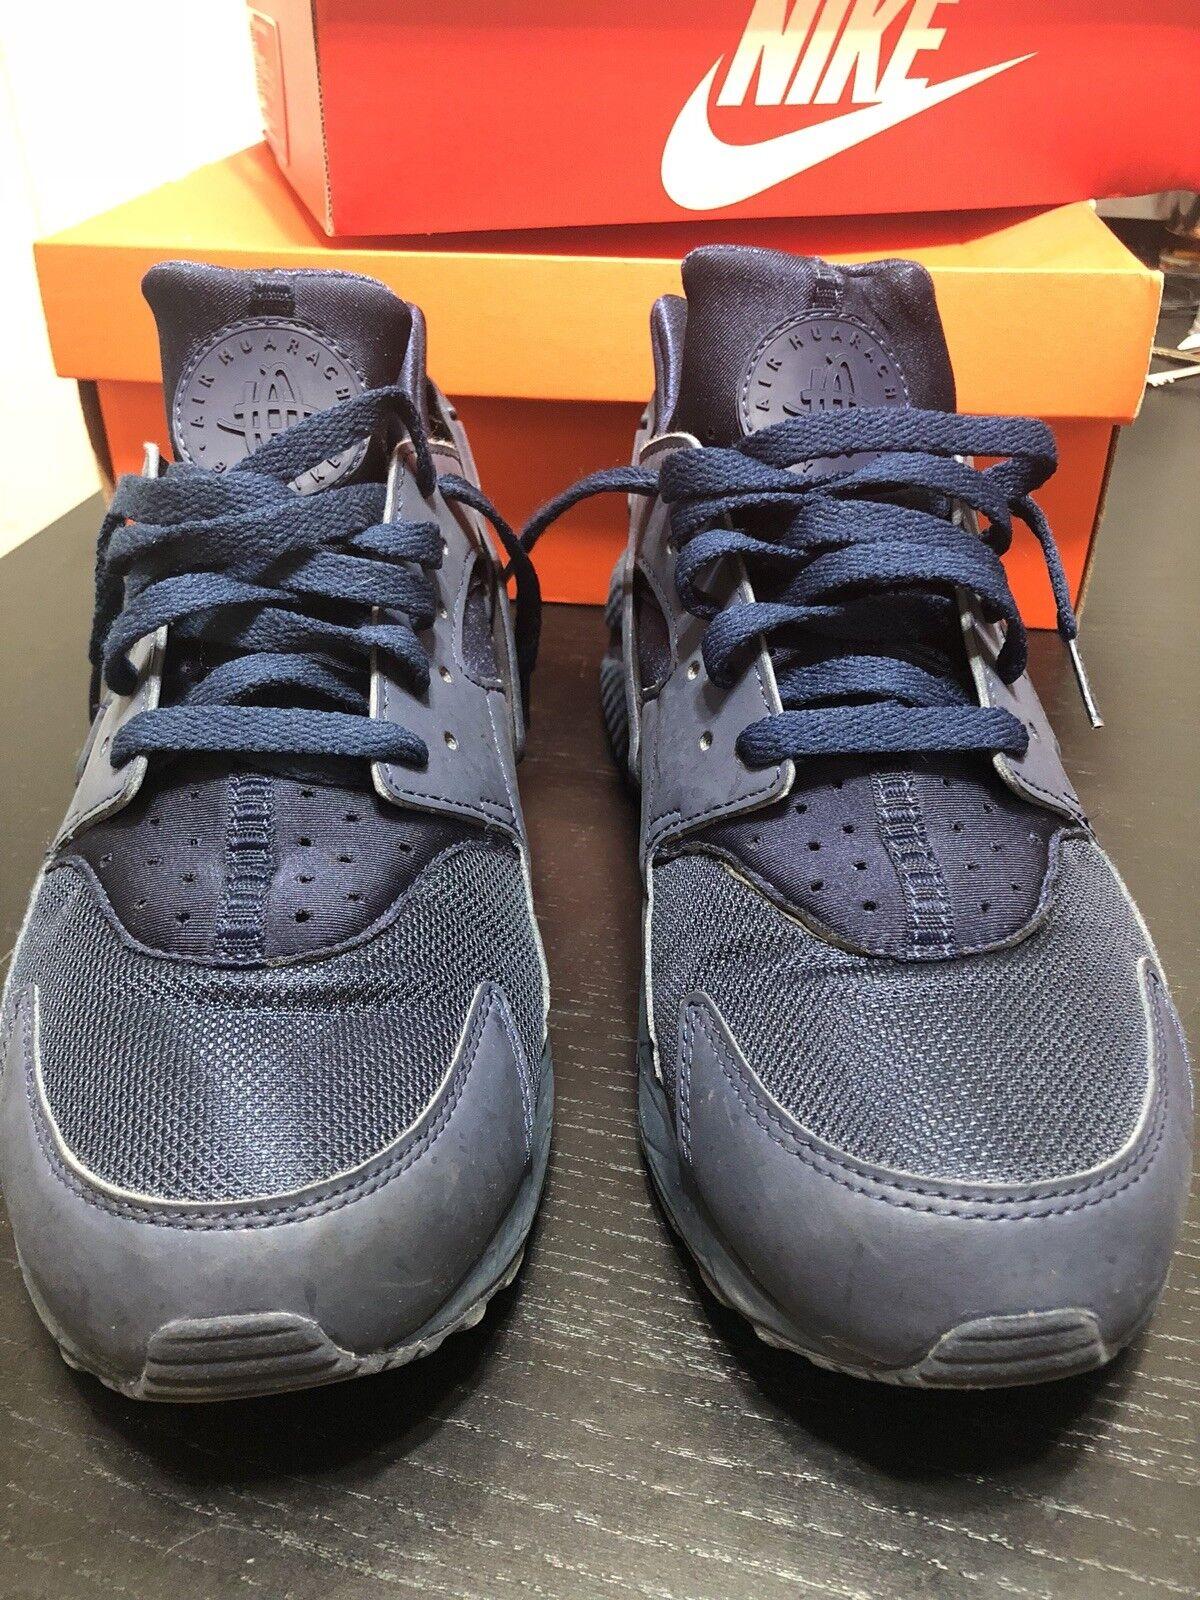 Nike Air Huarache Midnight Navy bluee Trainer Sneaker 318429-440 Size 10.5